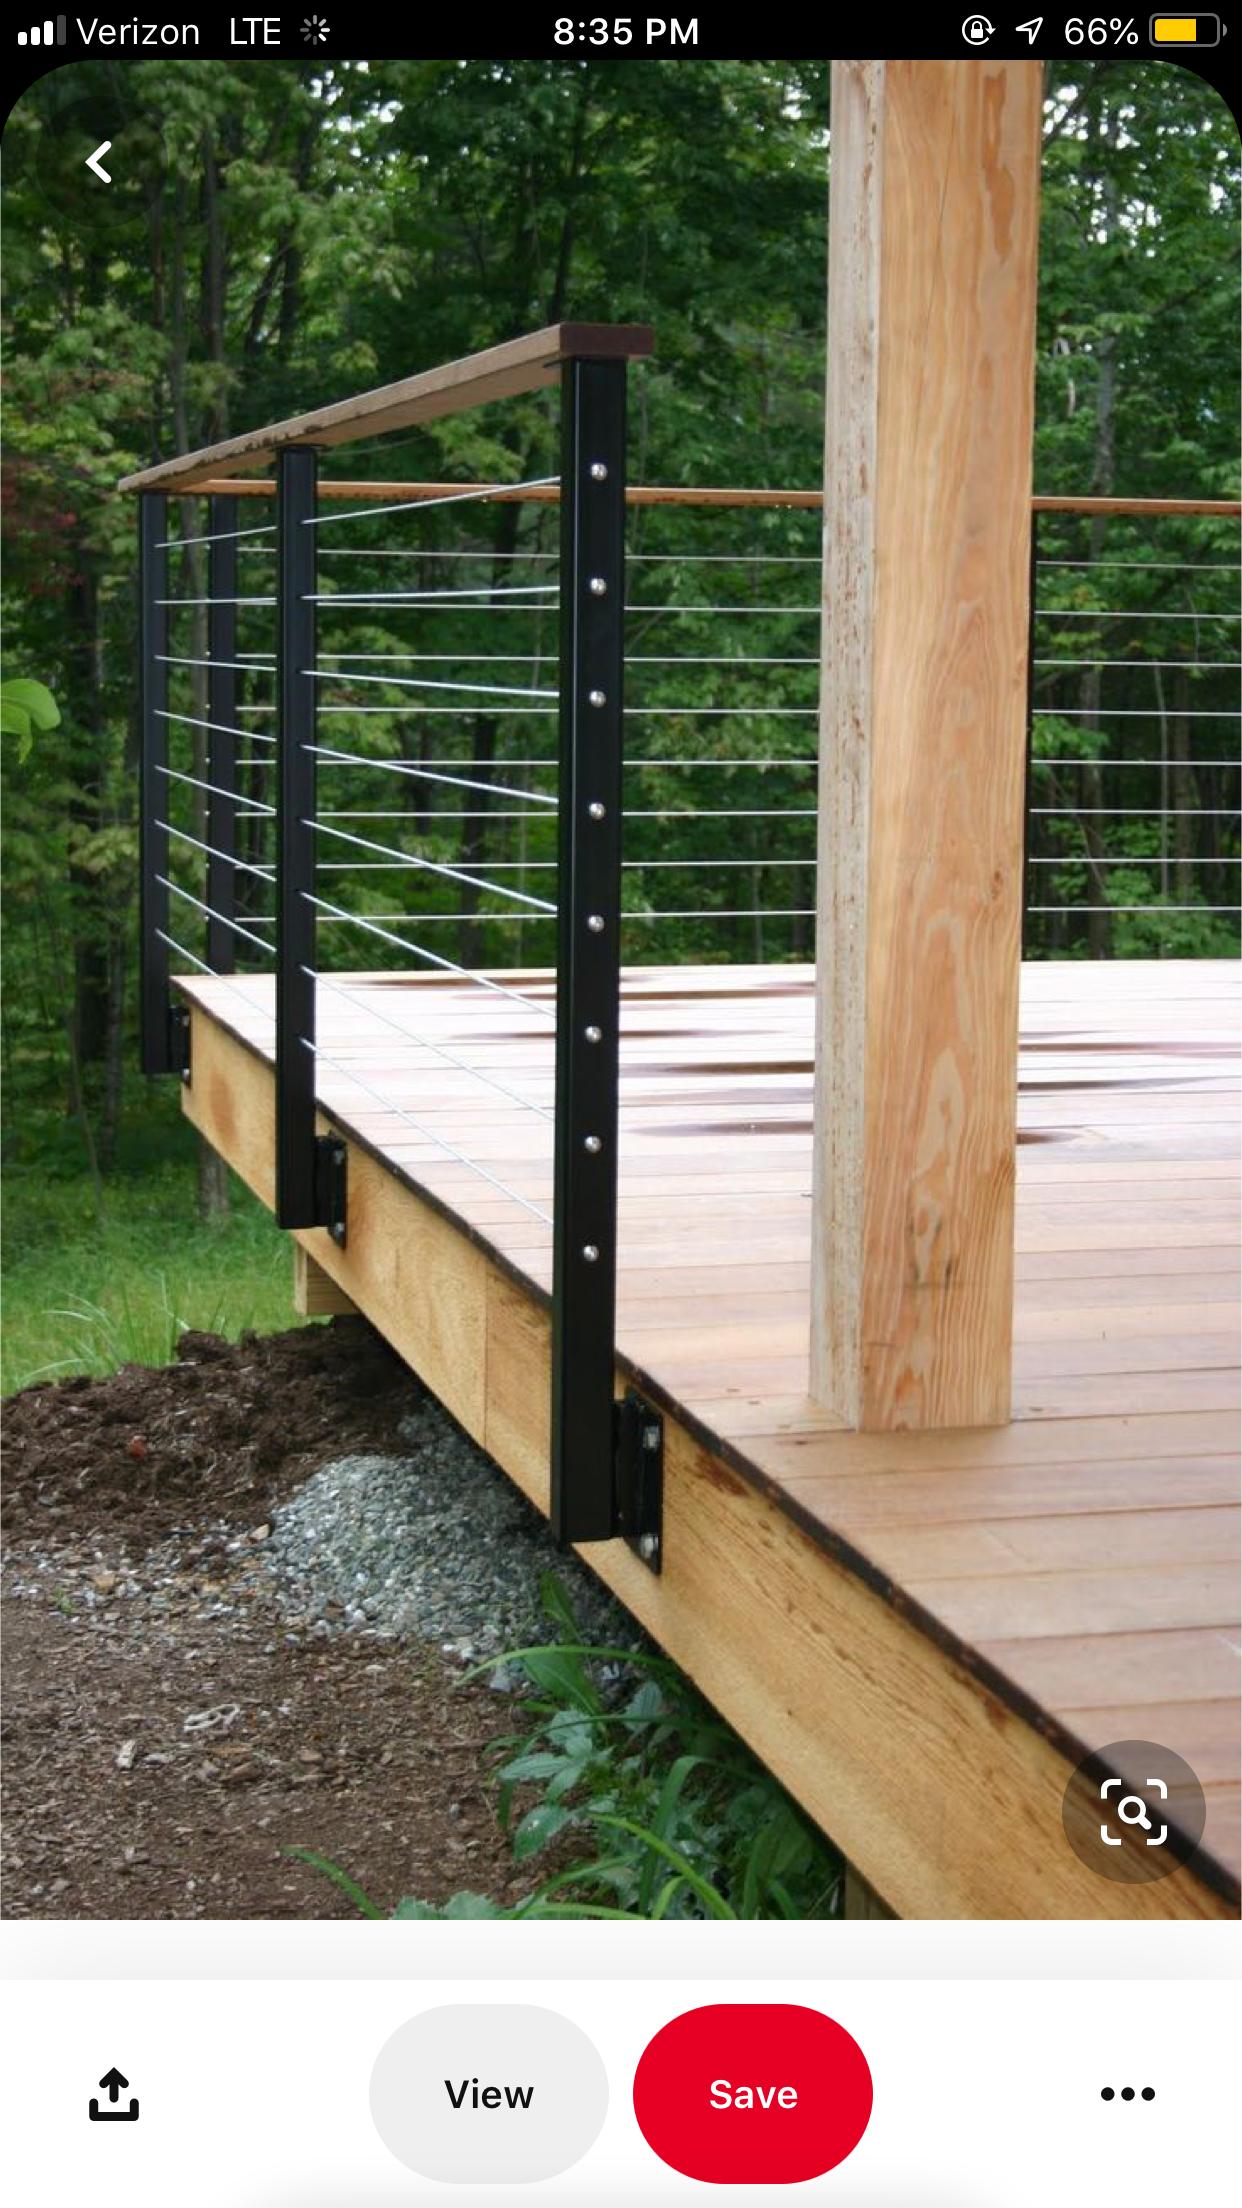 Pin by Flotsam Jetsam on Deck ideas in 2020 | Deck railing ...